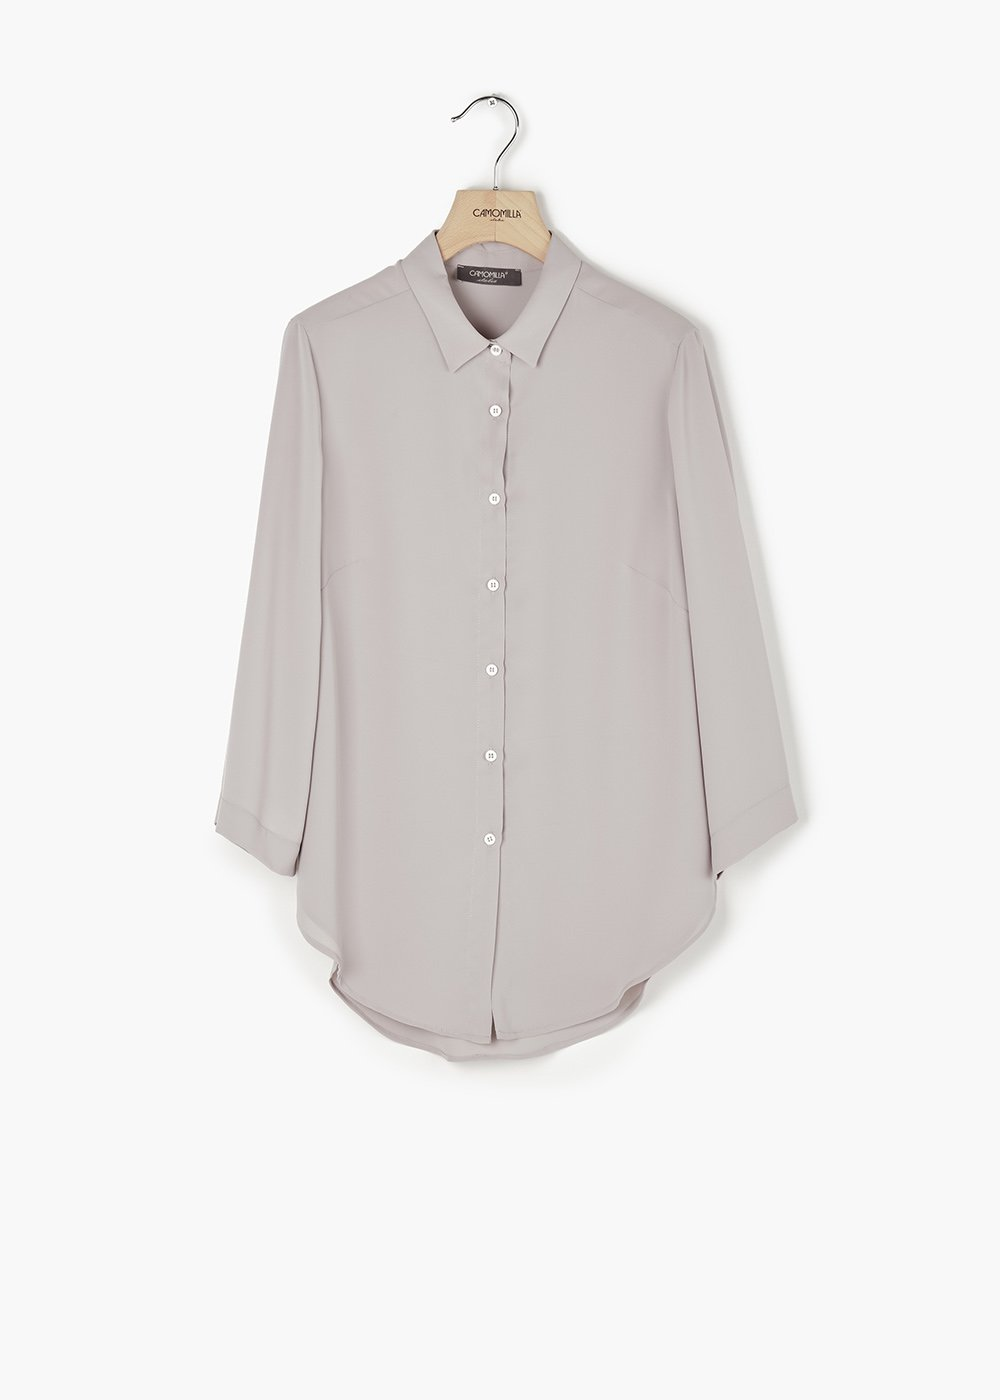 Carlotta shirt with collar and buttons - Light Grey - Woman